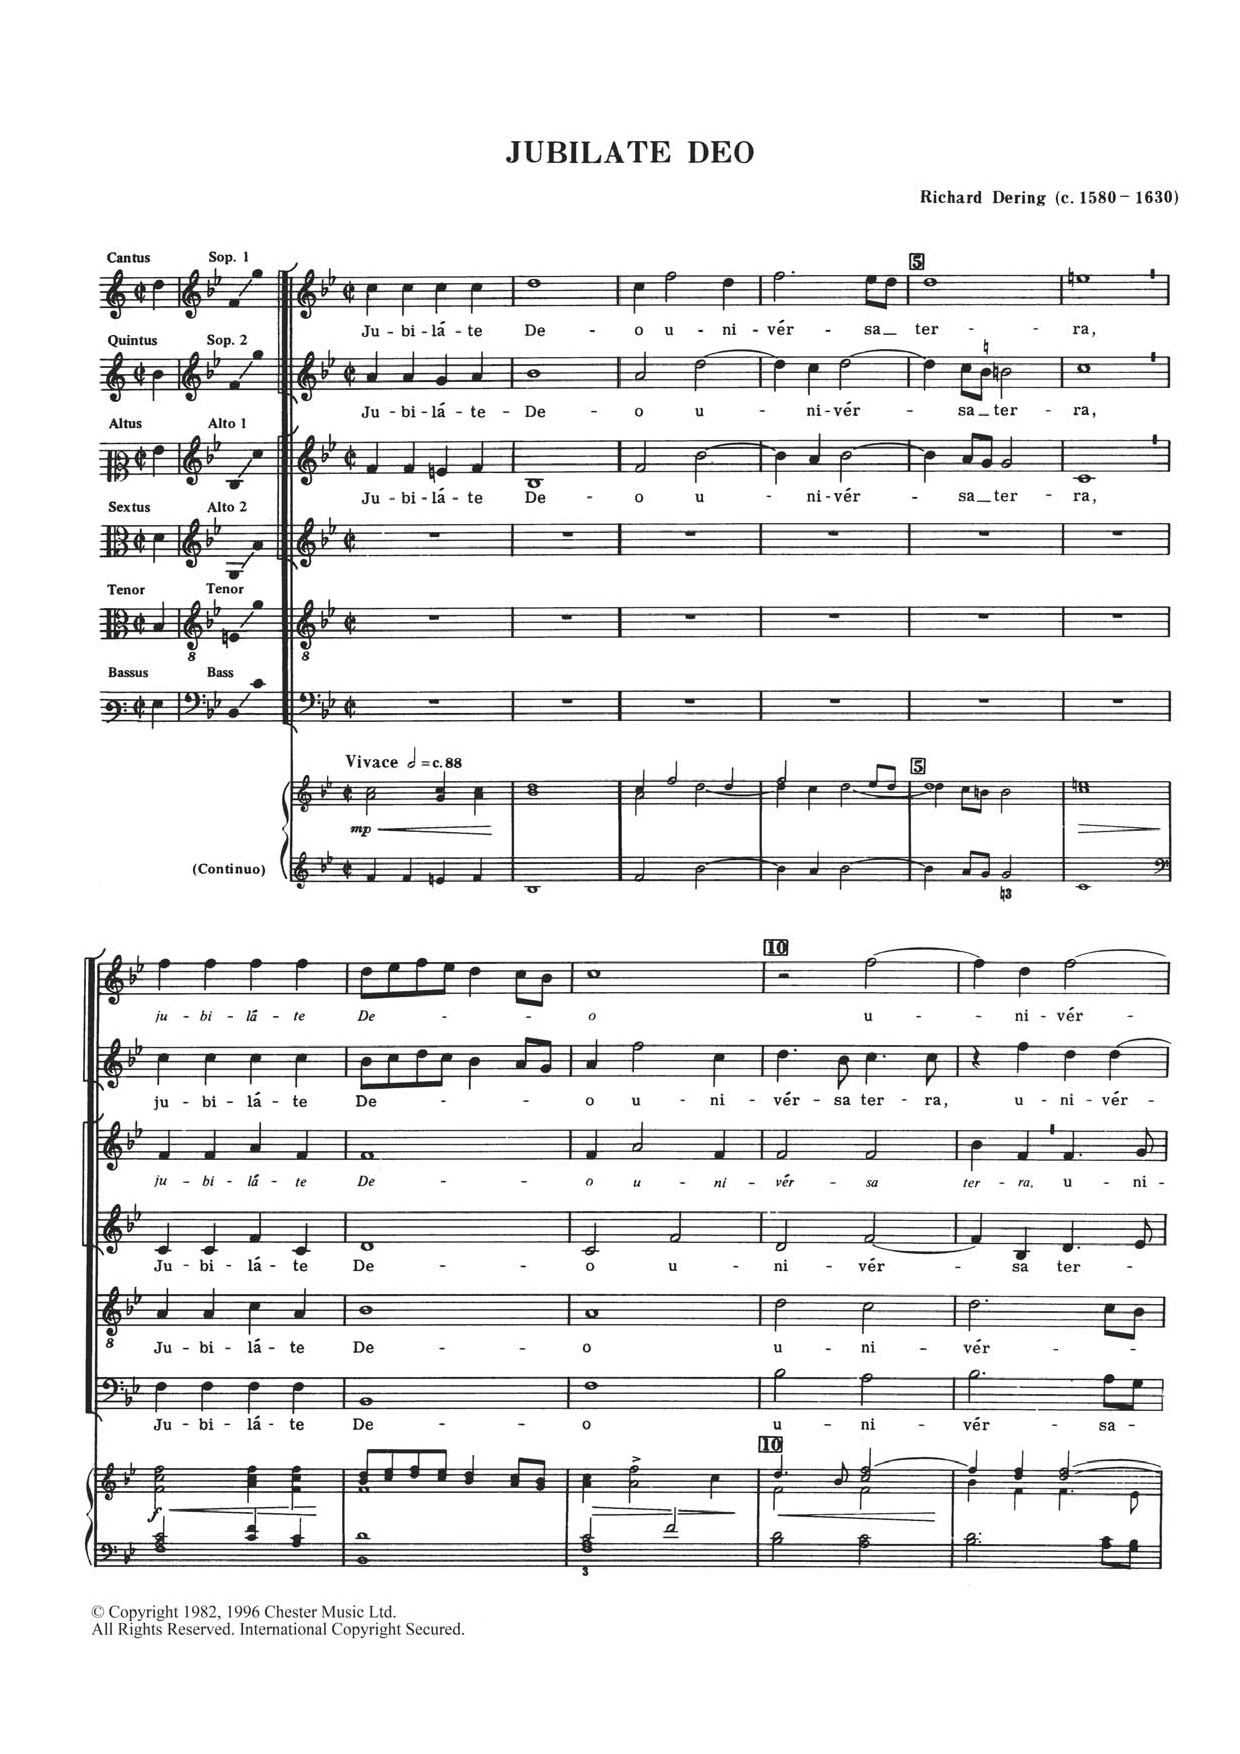 Richard Dering - Jubilate Deo